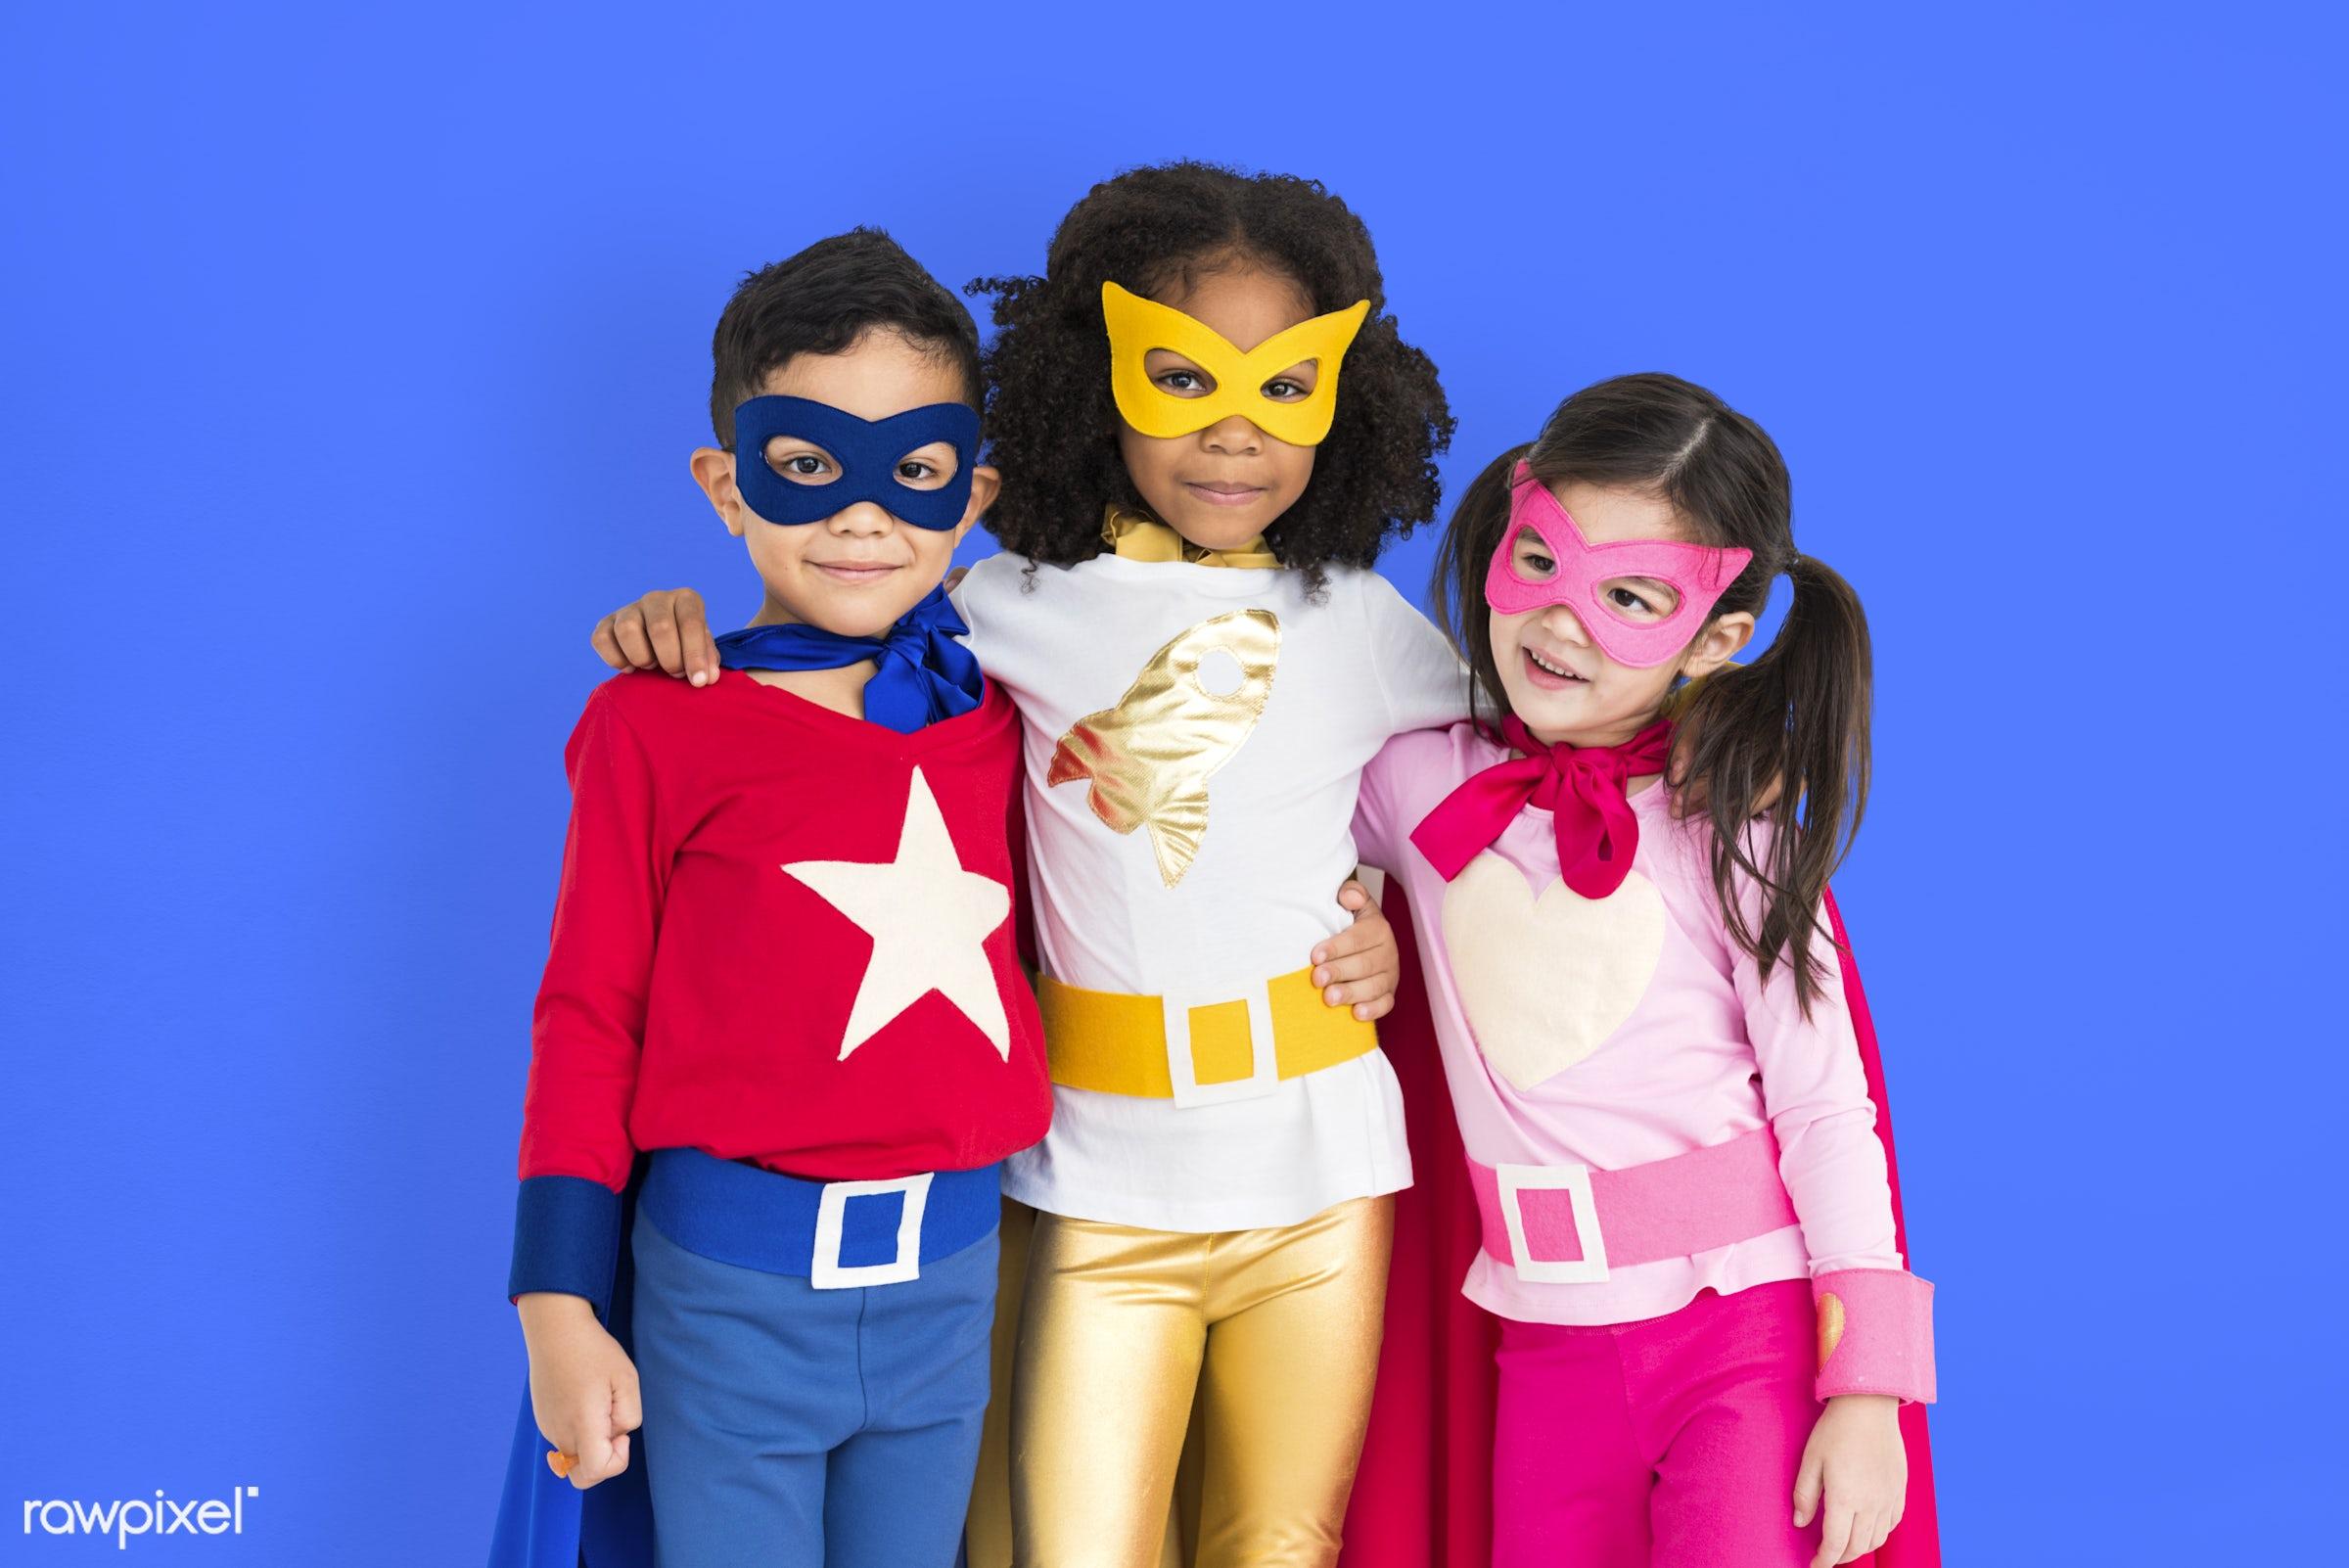 children, courageous, kid, adolescence, child, girl, inspiration, leader, idol, childhood, superhero, isolated, hero,...